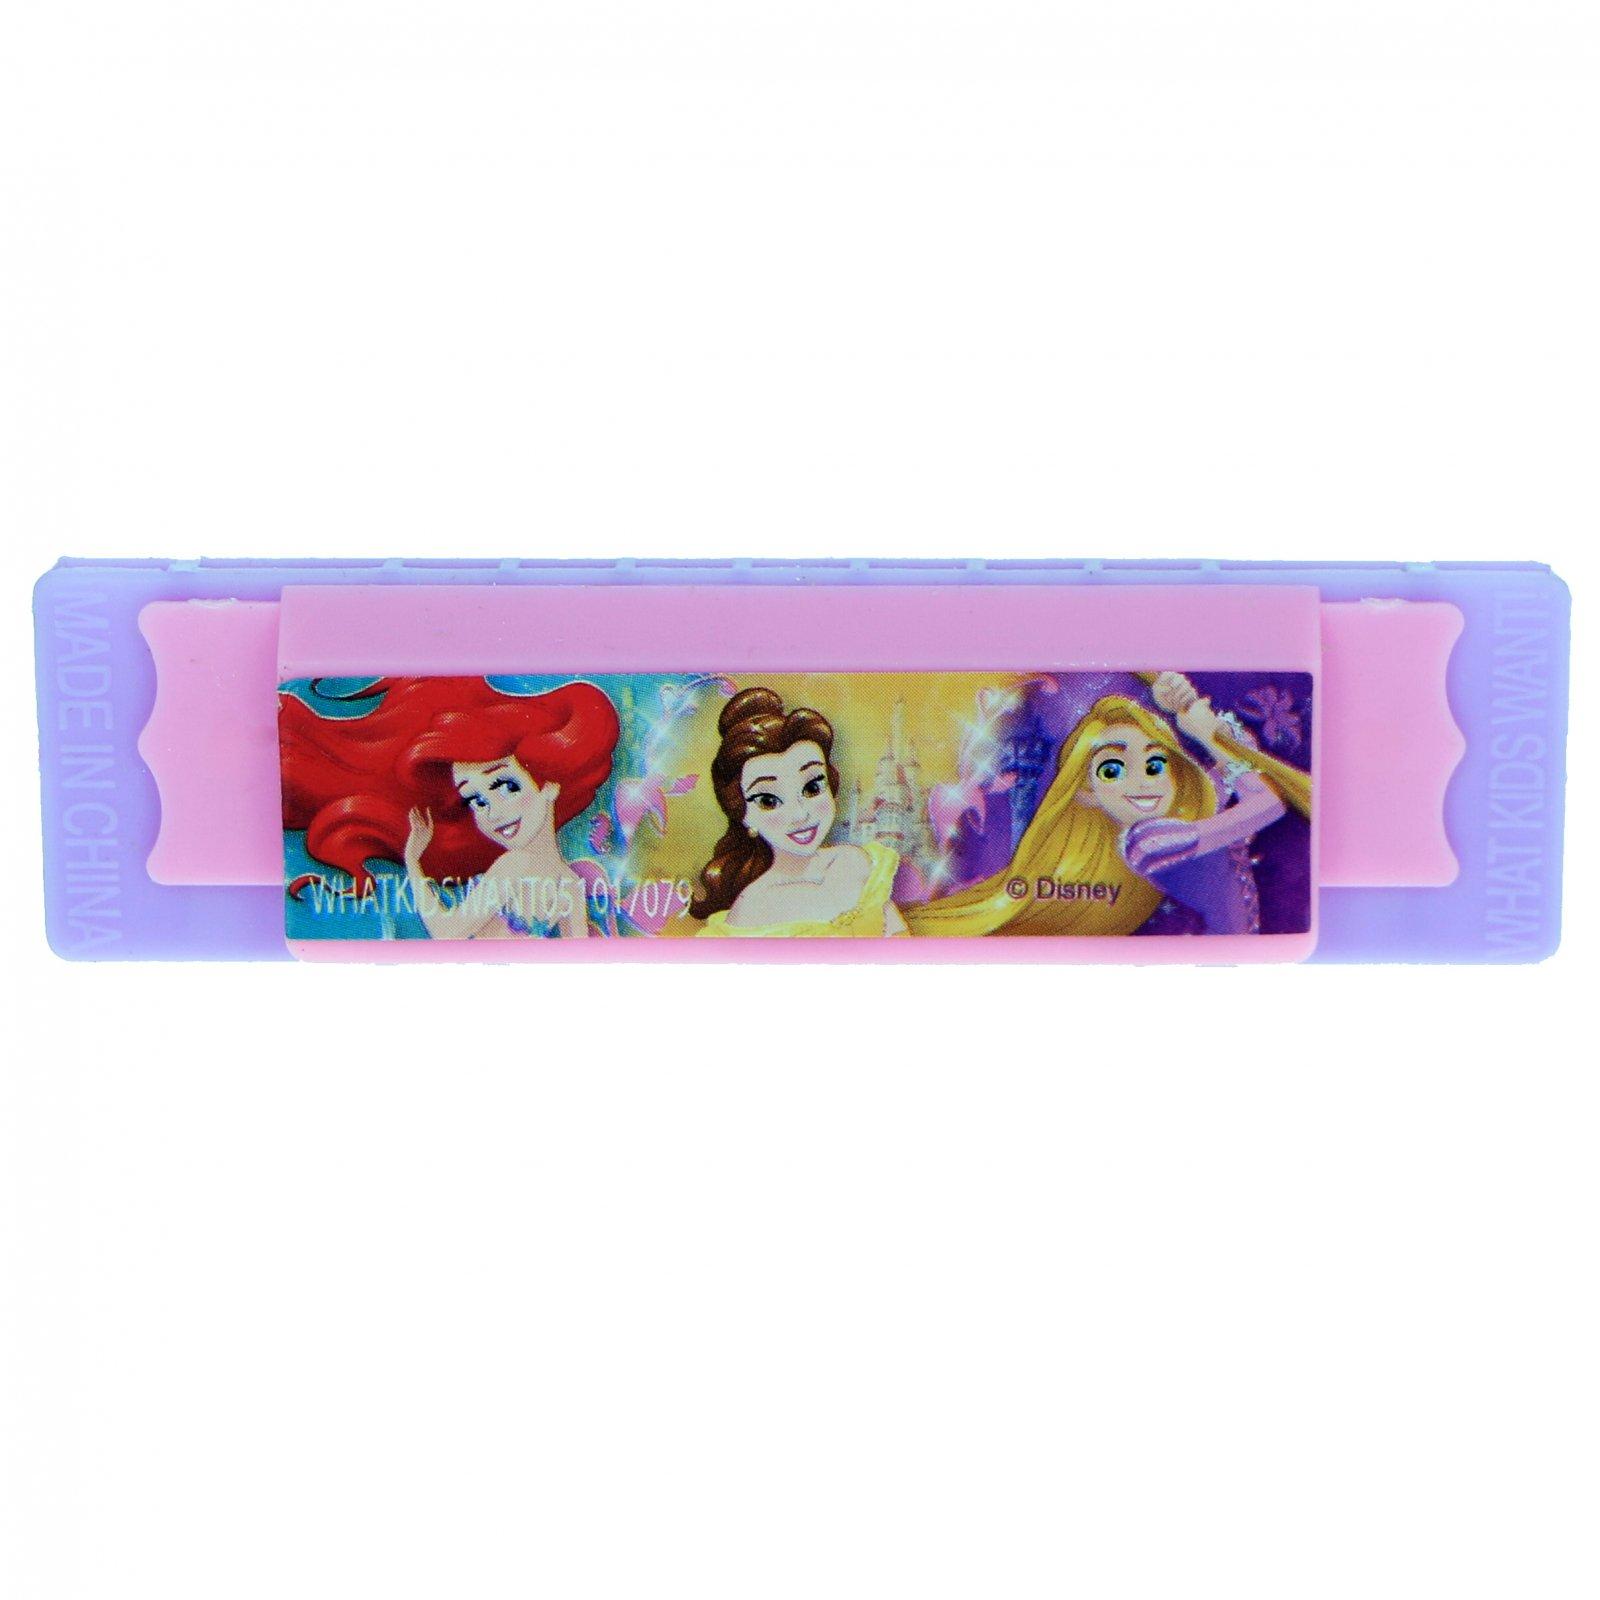 Disney Princess Girls Mini Harmonicas Kids Musical Instrument Toys - 4 Pack